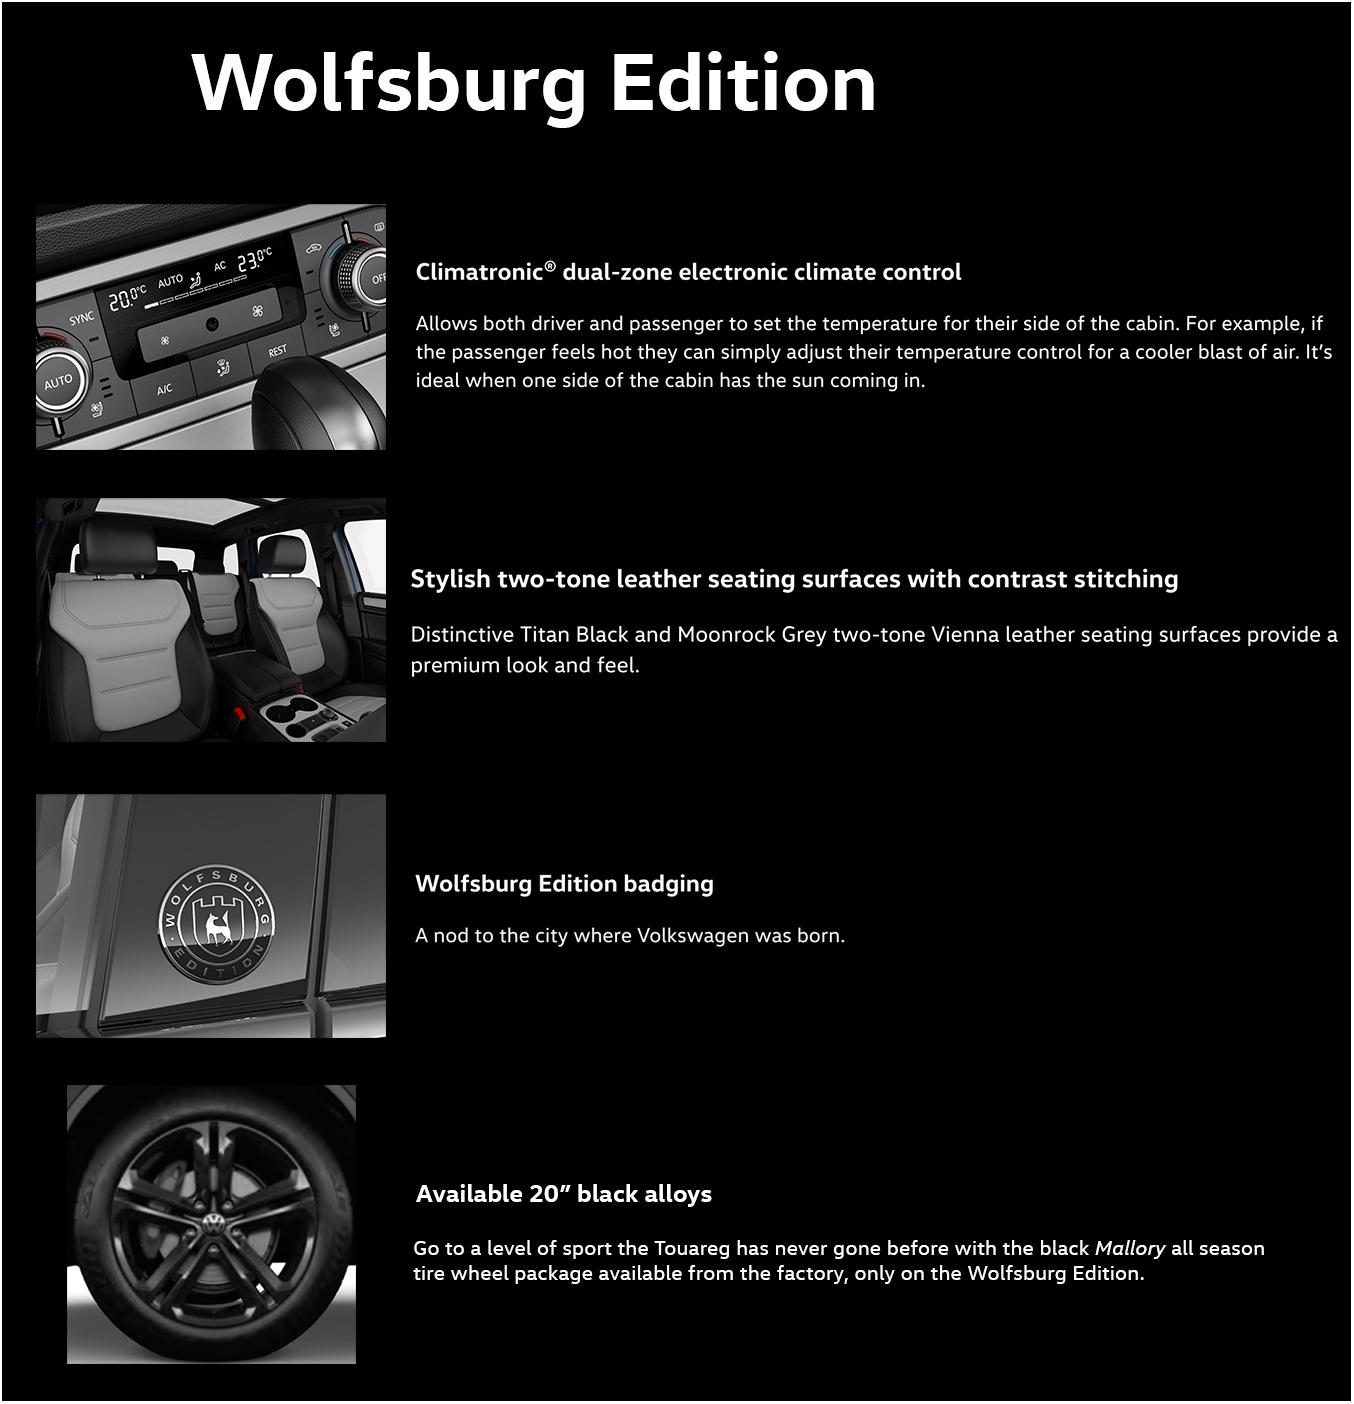 2017 touareg Wolfsburg edition